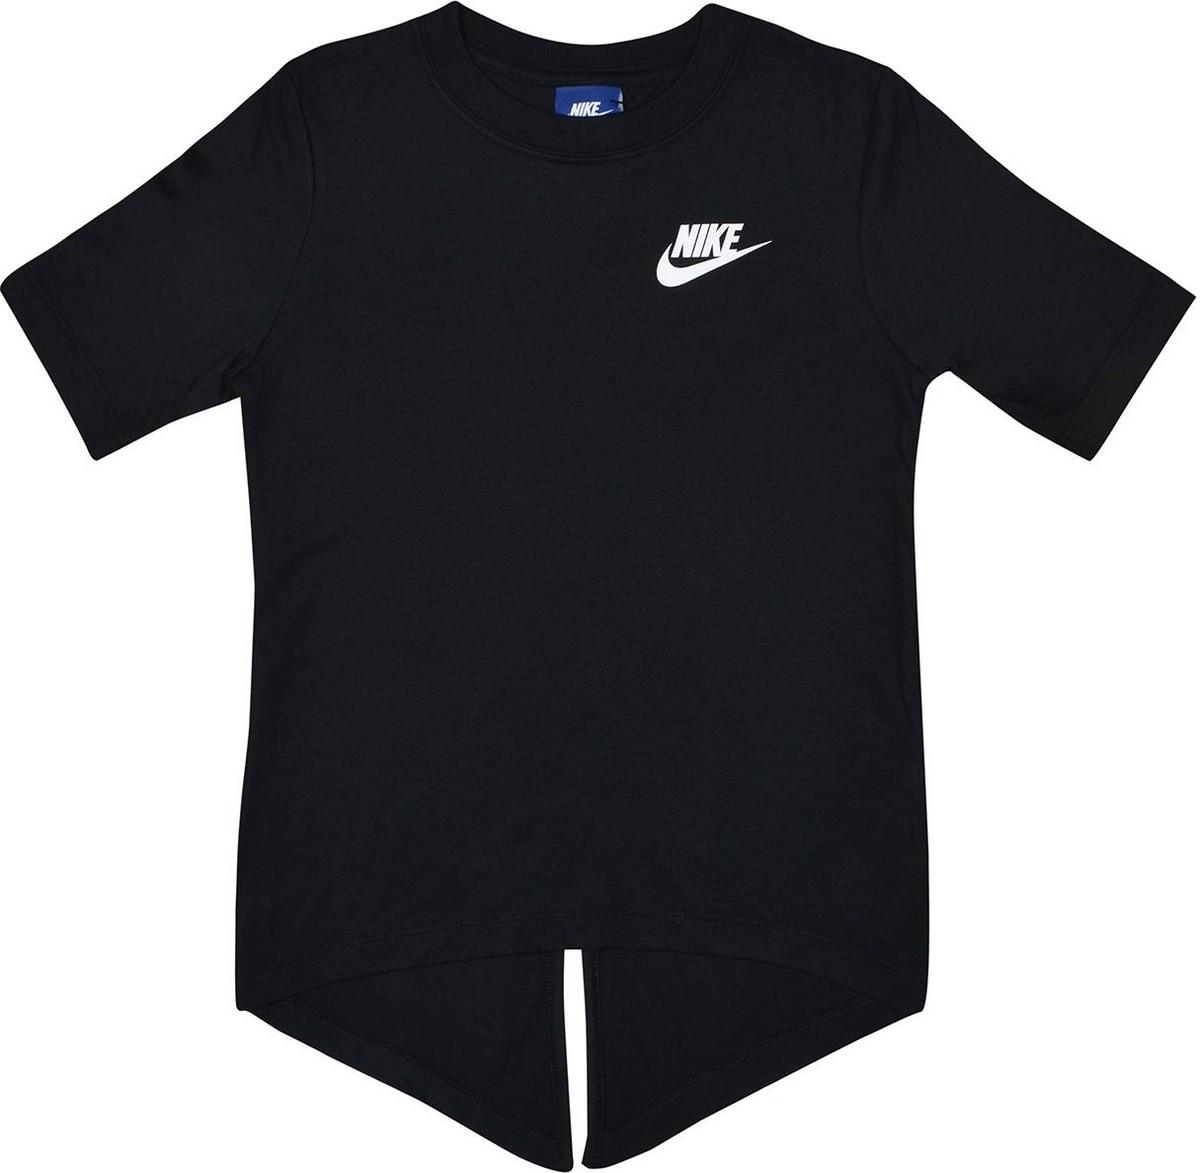 6aabab84b6d7 Nike  Όλα τα προϊόντα